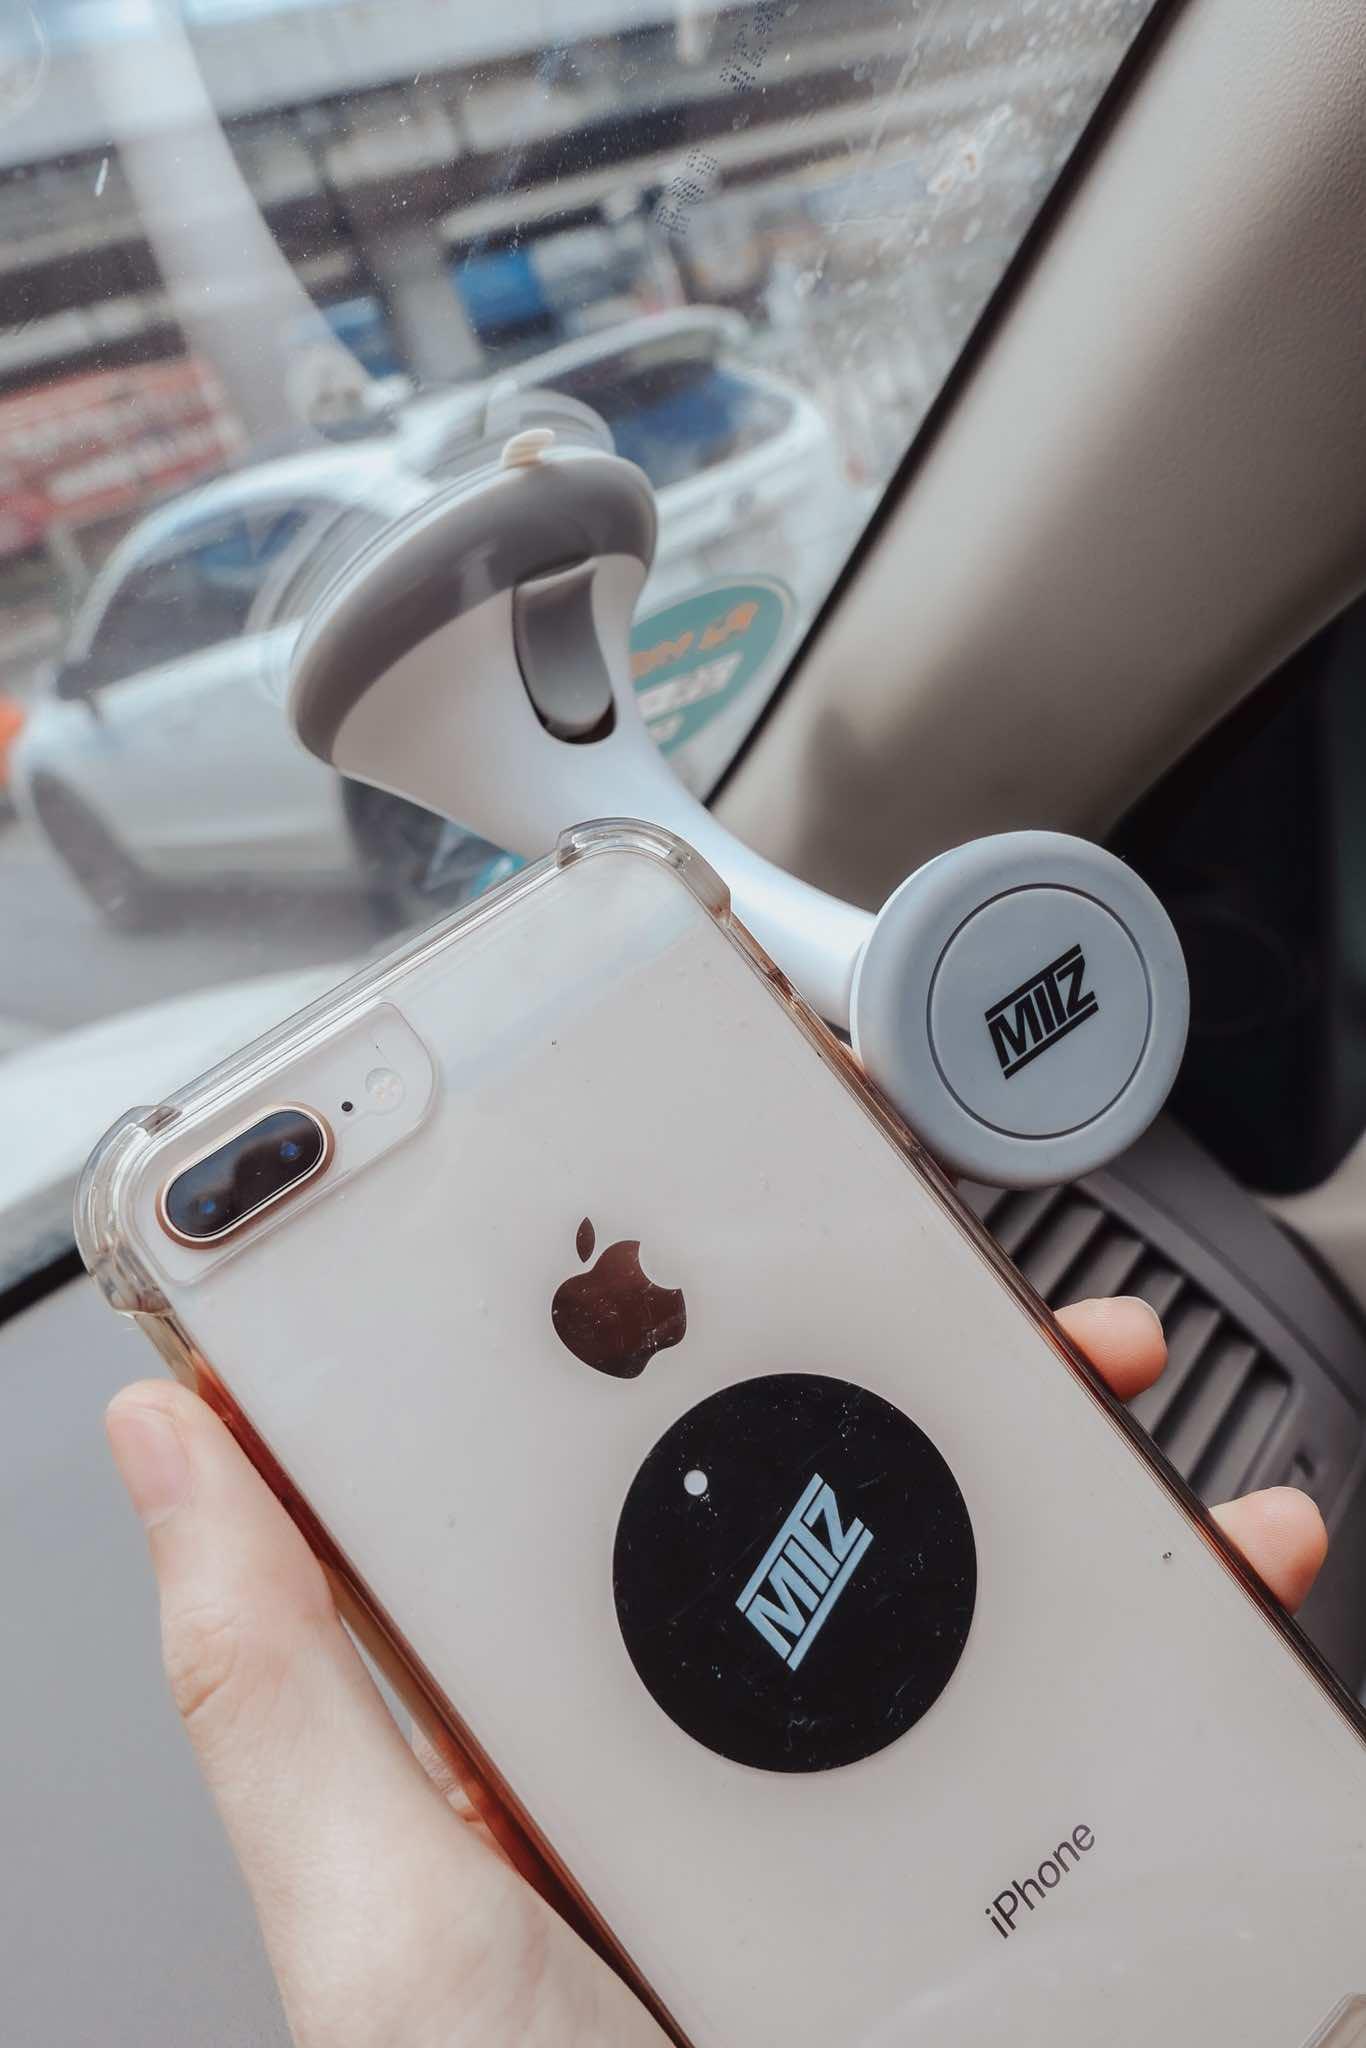 MITZ Phone Buddy - แท่นวางมือถือแม่เหล็ก บนรถ โต๊ะ Magnetic Car Phone holder สะดวก ไม่หลุด